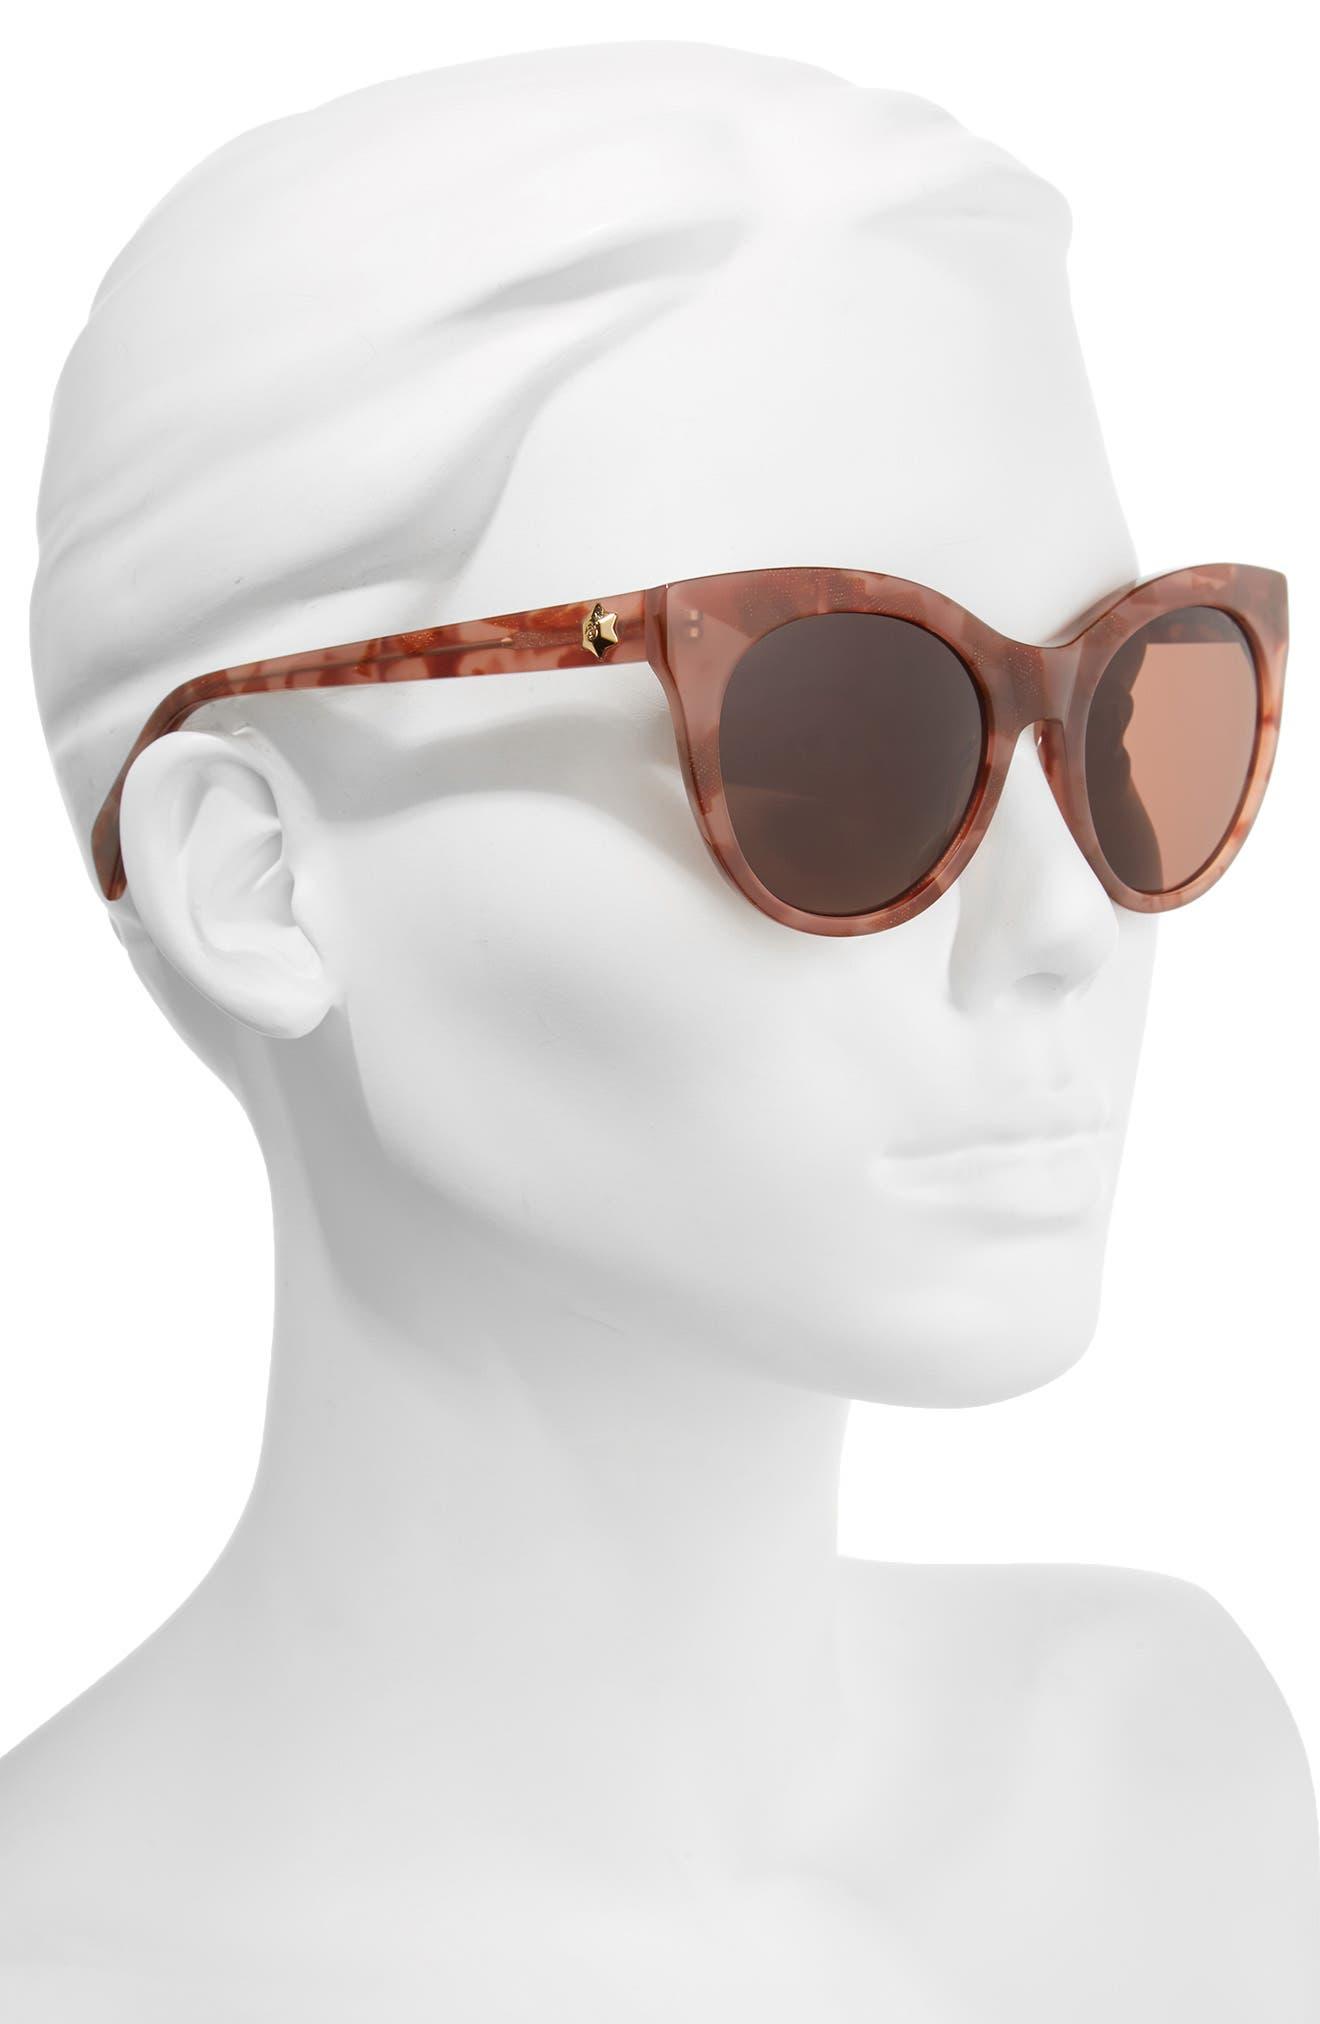 52mm Round Cat Eye Sunglasses,                             Alternate thumbnail 8, color,